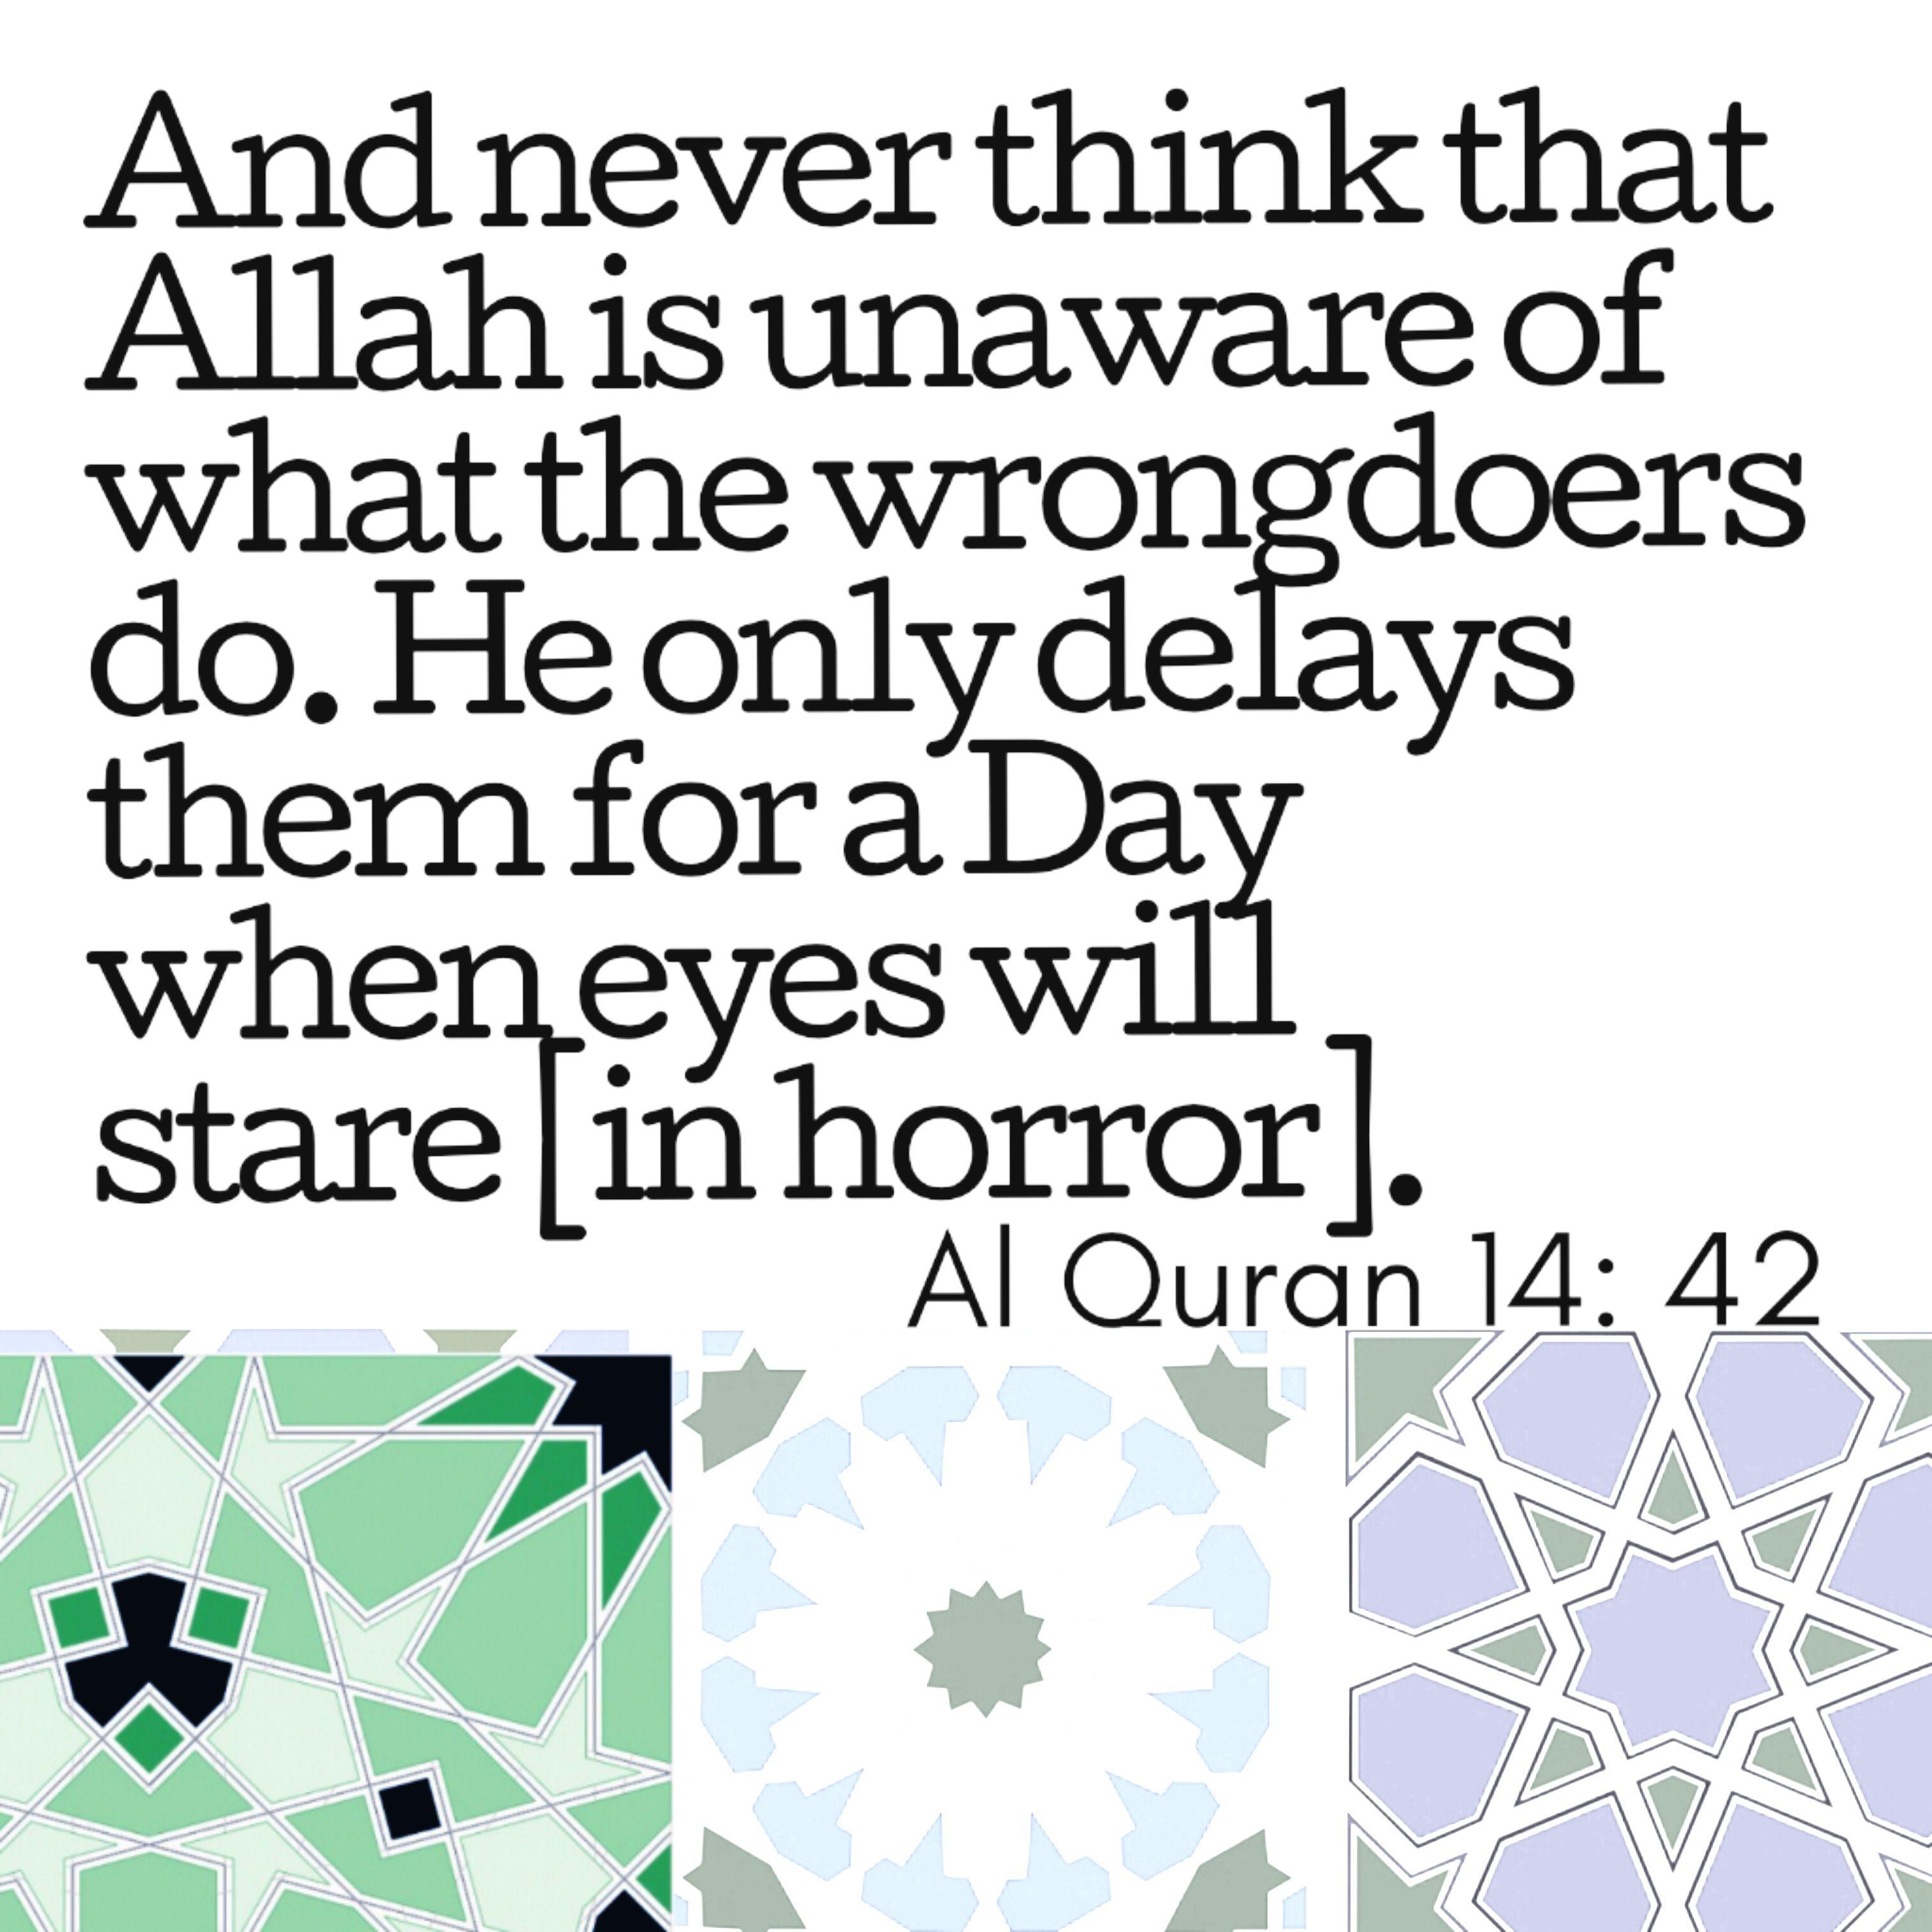 Pin by Islam on Quran and Hadith | Quran, Hadith, King of kings